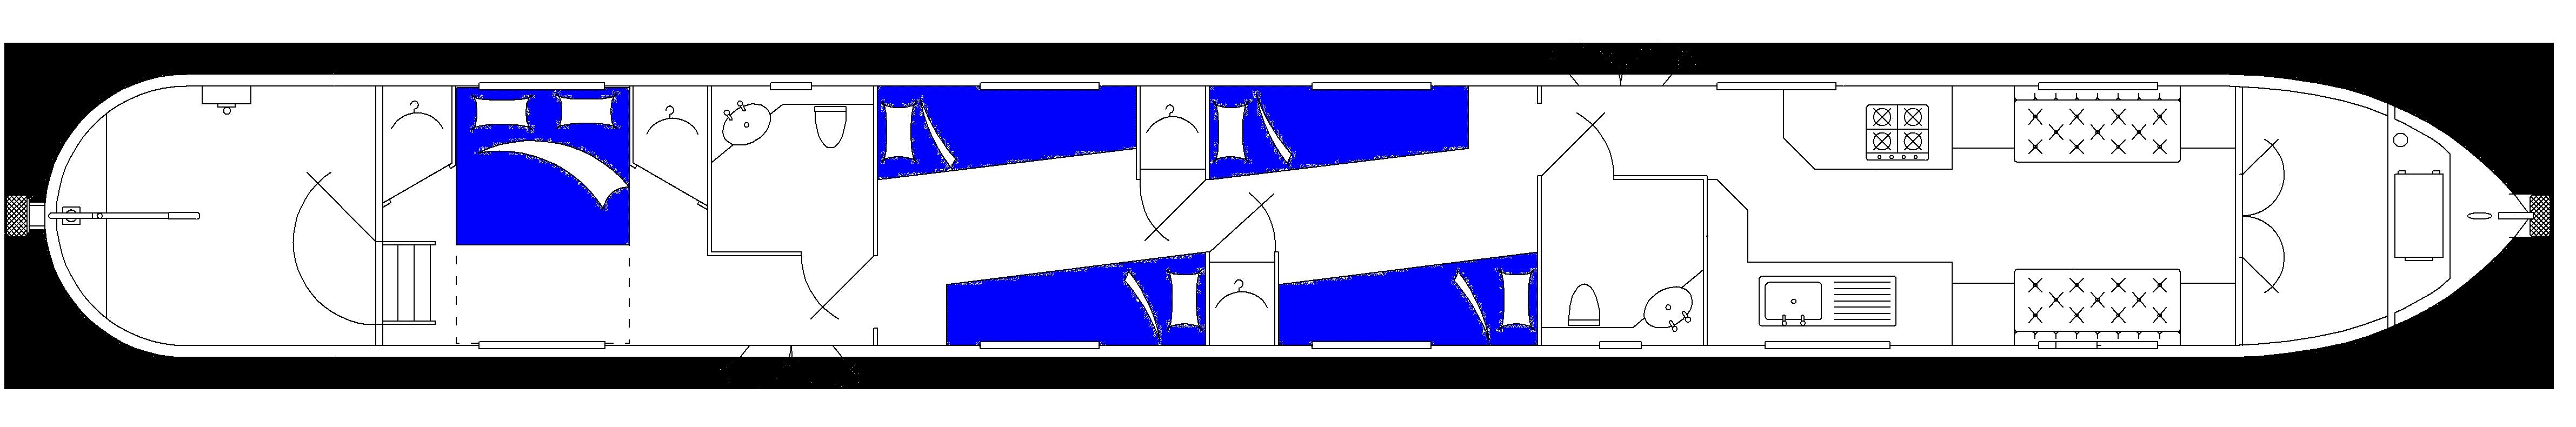 Star12 layout 1